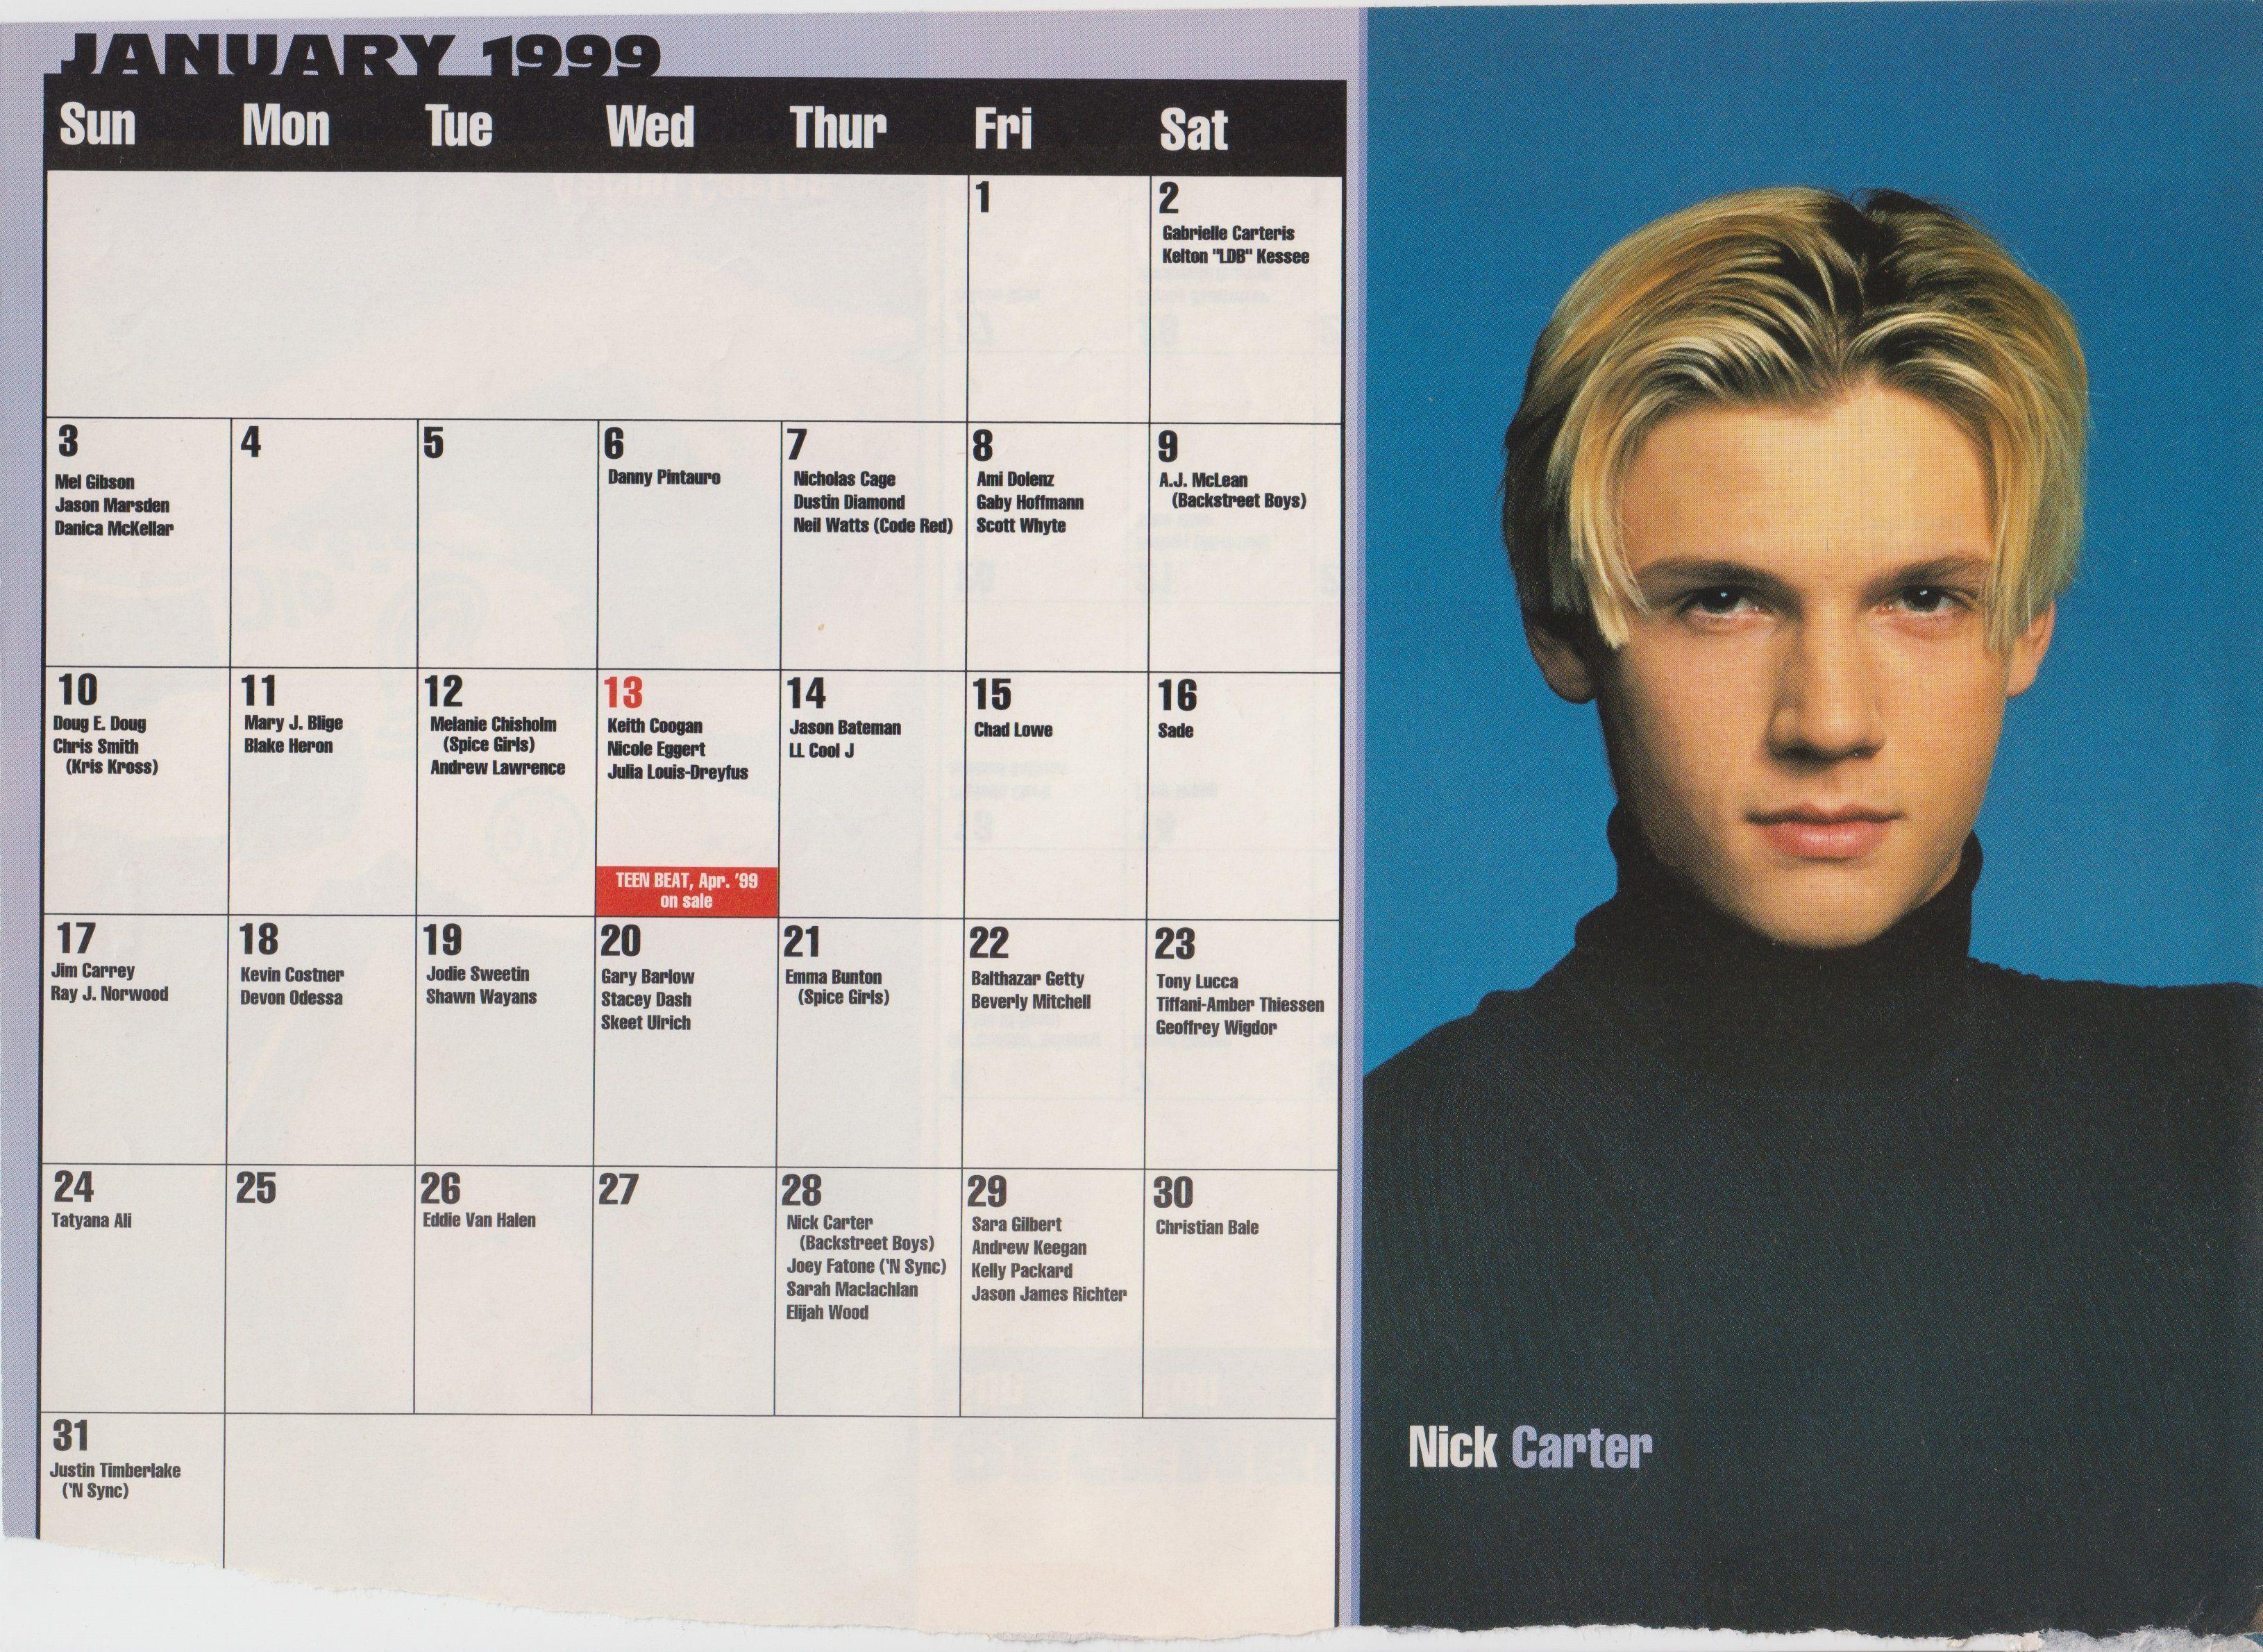 1999 Celebrity Birthday Calendar January Nick Carter